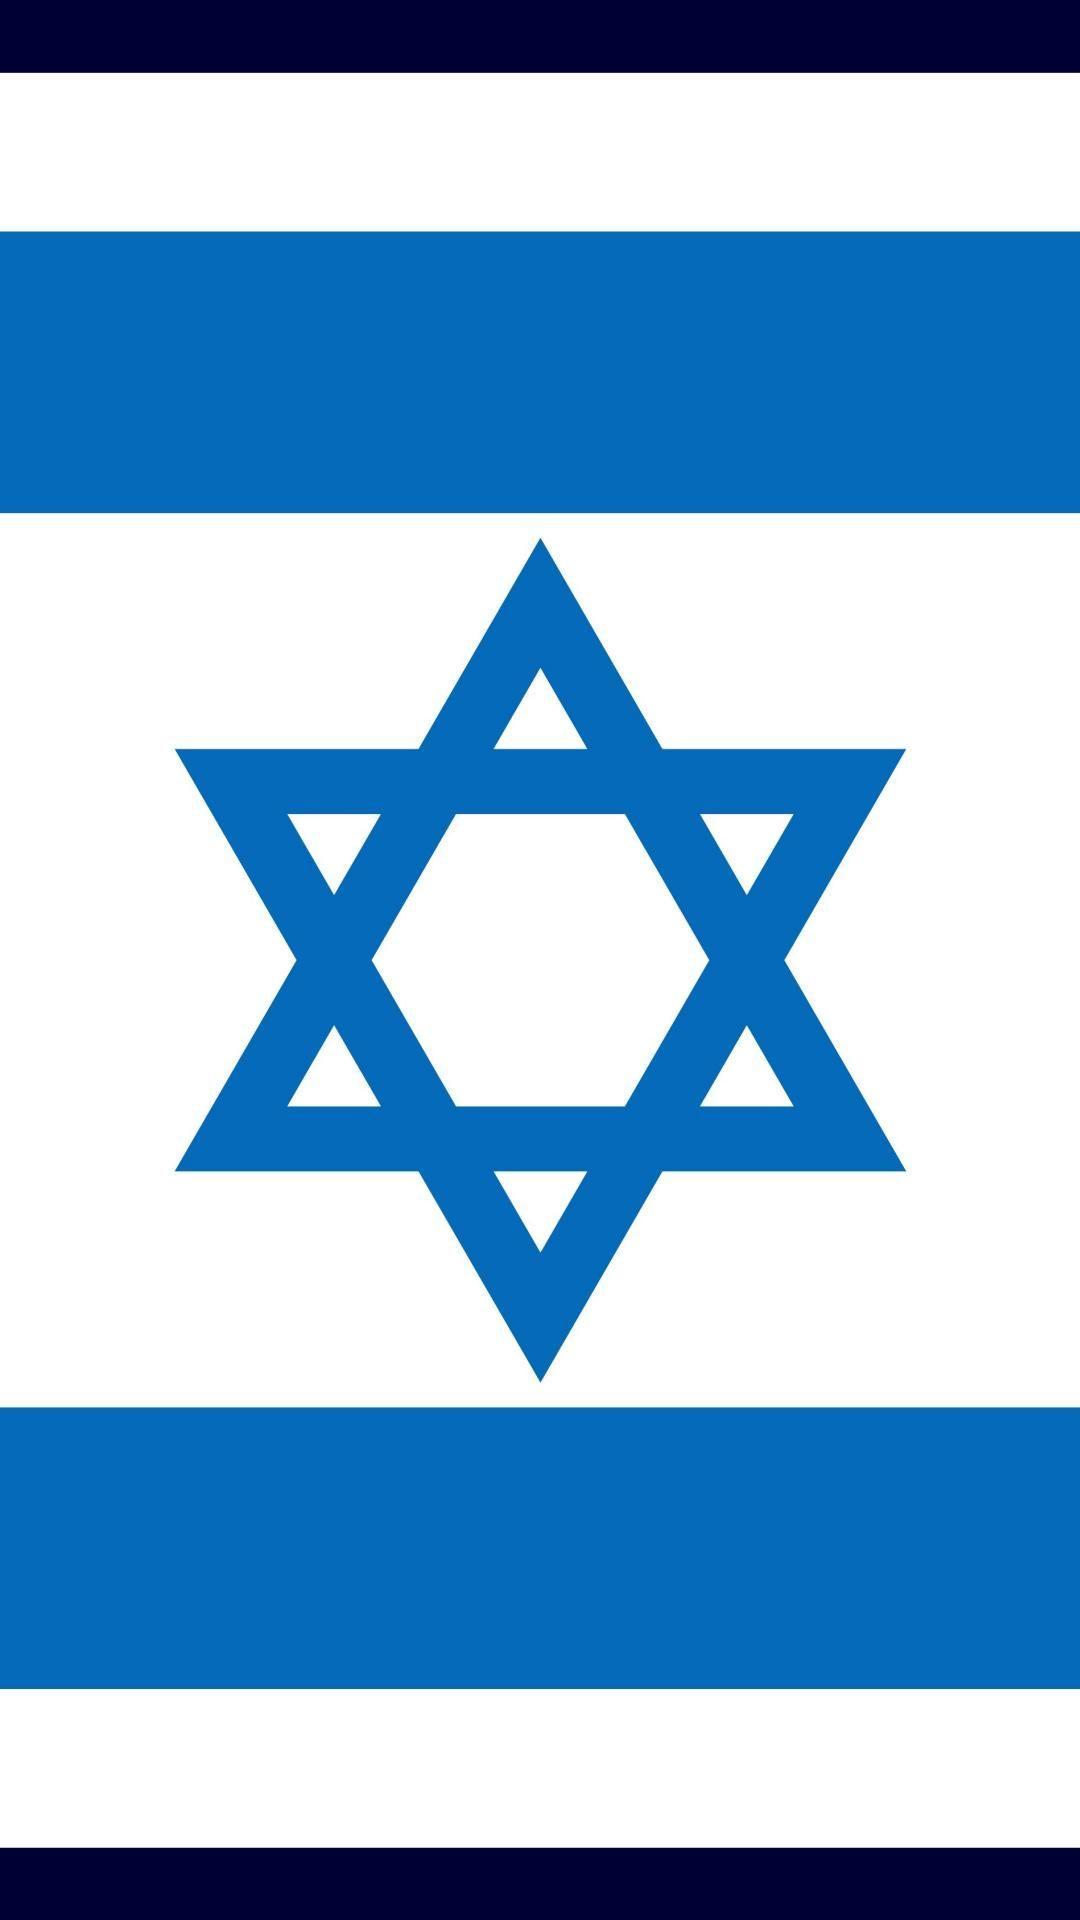 israel flag wallpapers top free